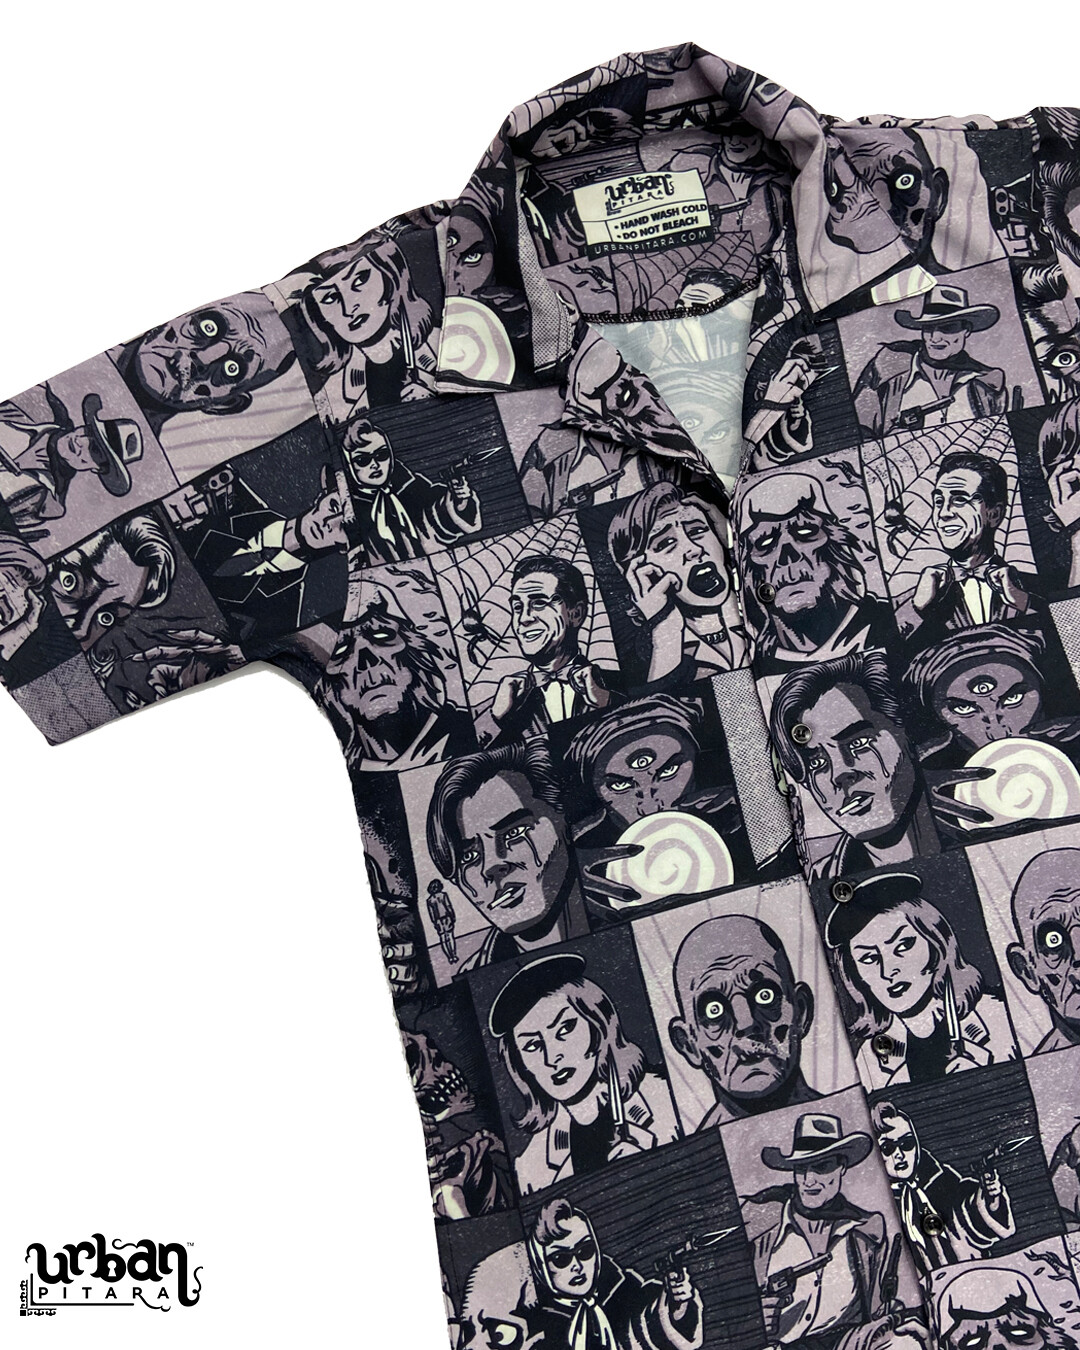 Killer Comics Monochrome Buttoned Shirt